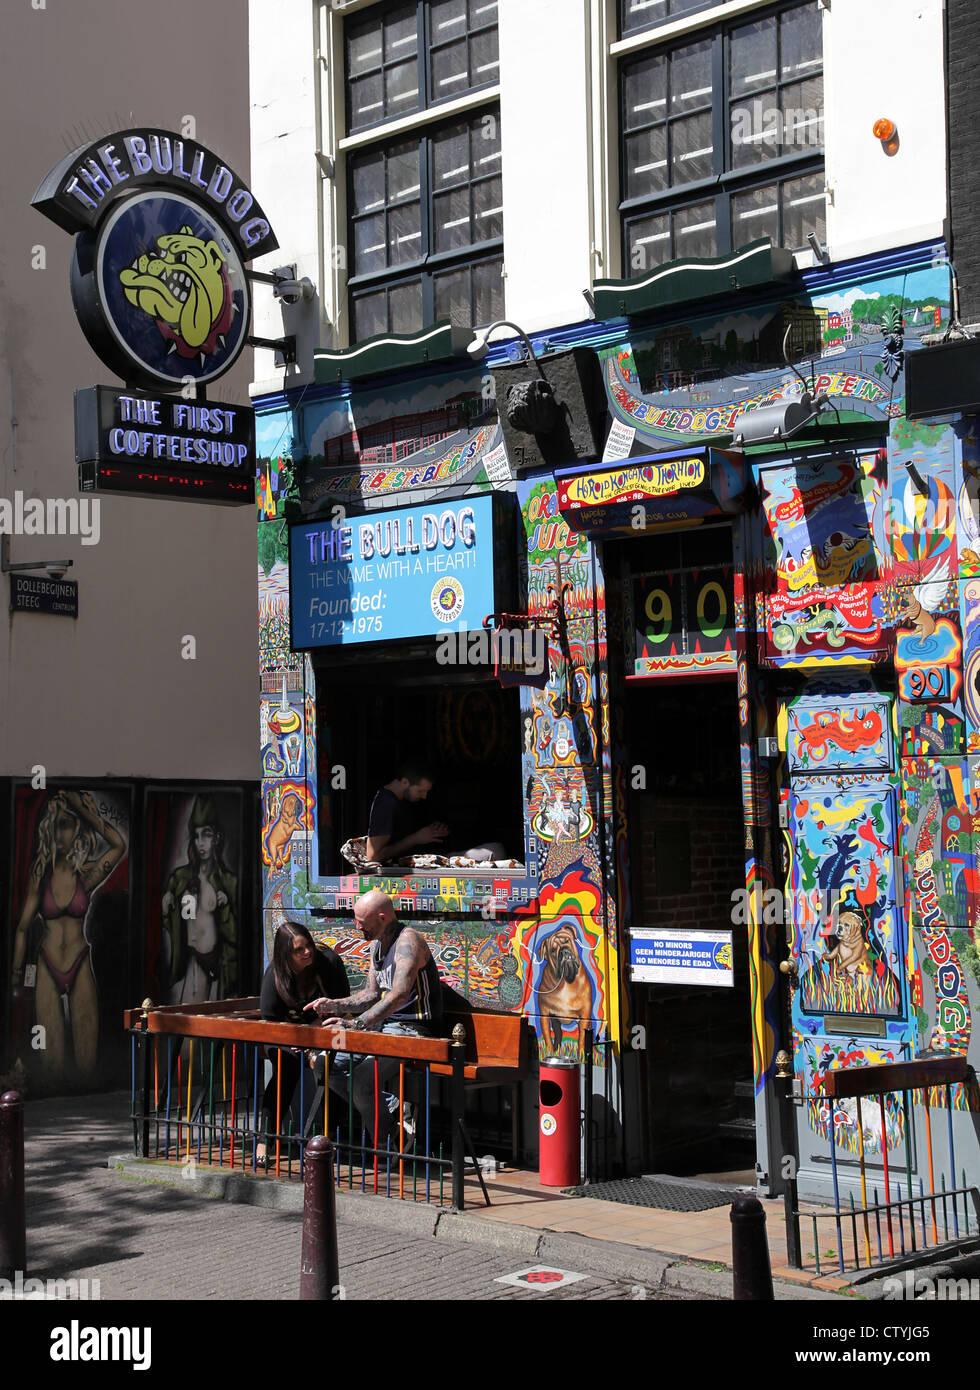 The Bulldog Amsterdam Coffeeshop Redlight Stock Photo: 49779749 - Alamy